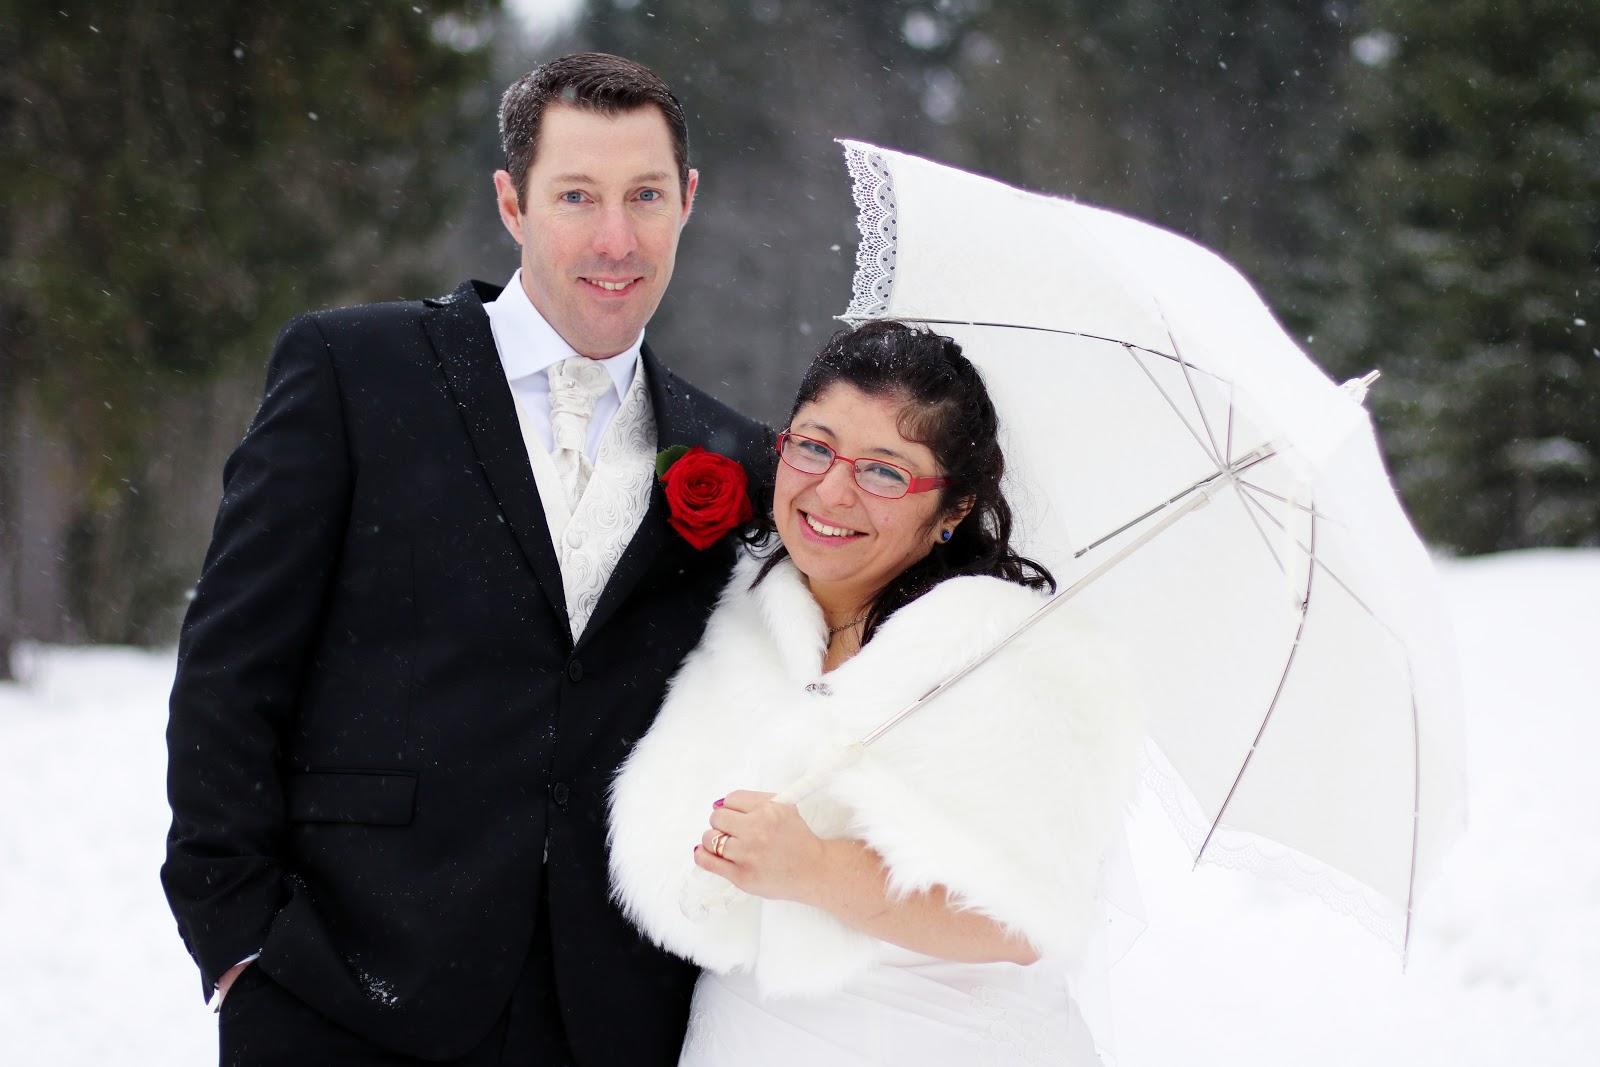 Fotograf Härnösand bröllopsfotograf Maria-Thérèse Sommar höga kusten sundsvall sollefteå umeå kramfors vinterbröllop winter wedding snow snö natur